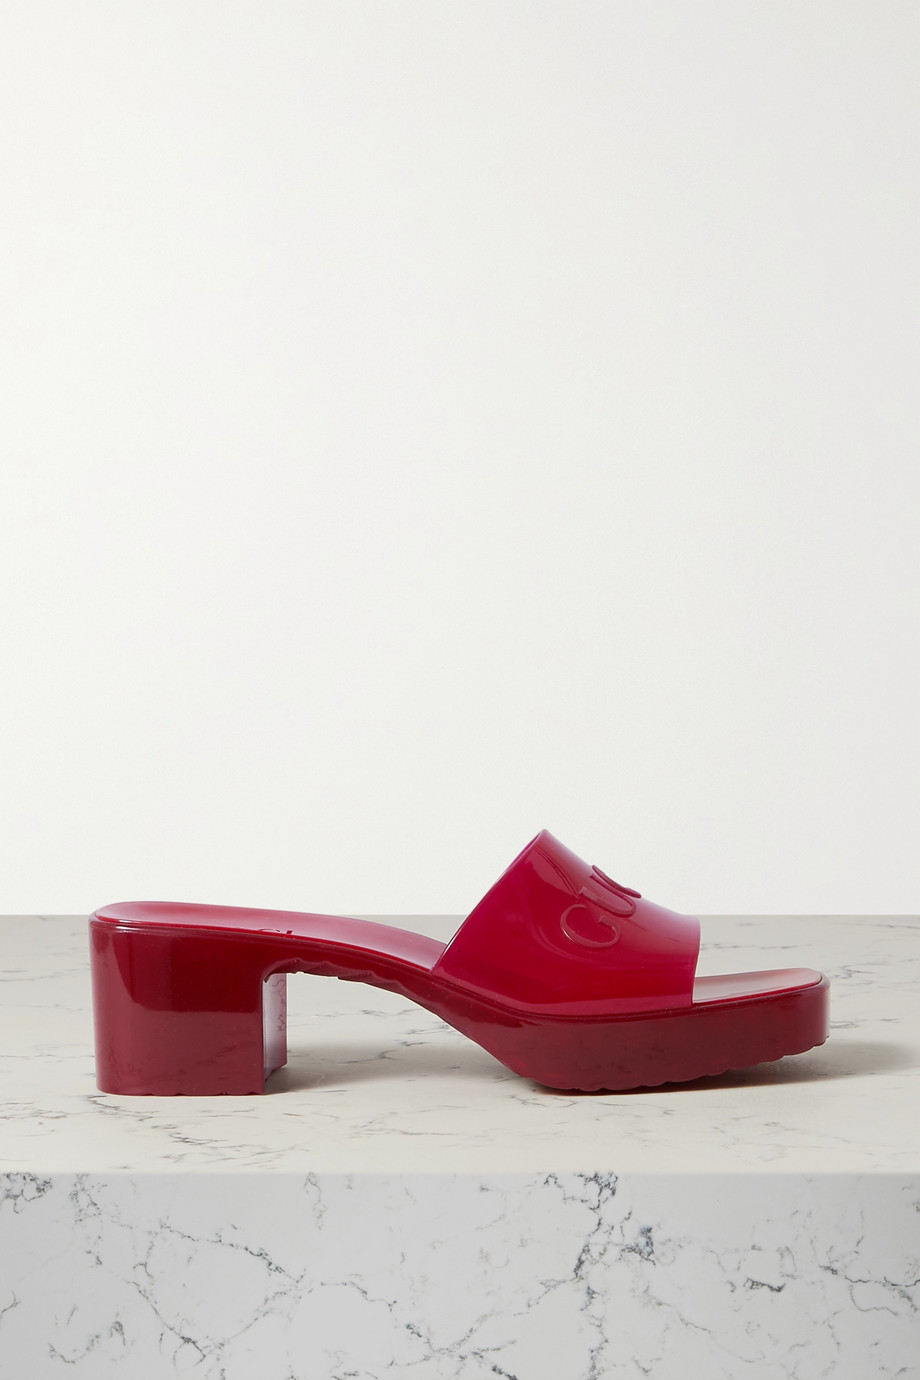 Gucci Plastique logo-embossed rubber mules